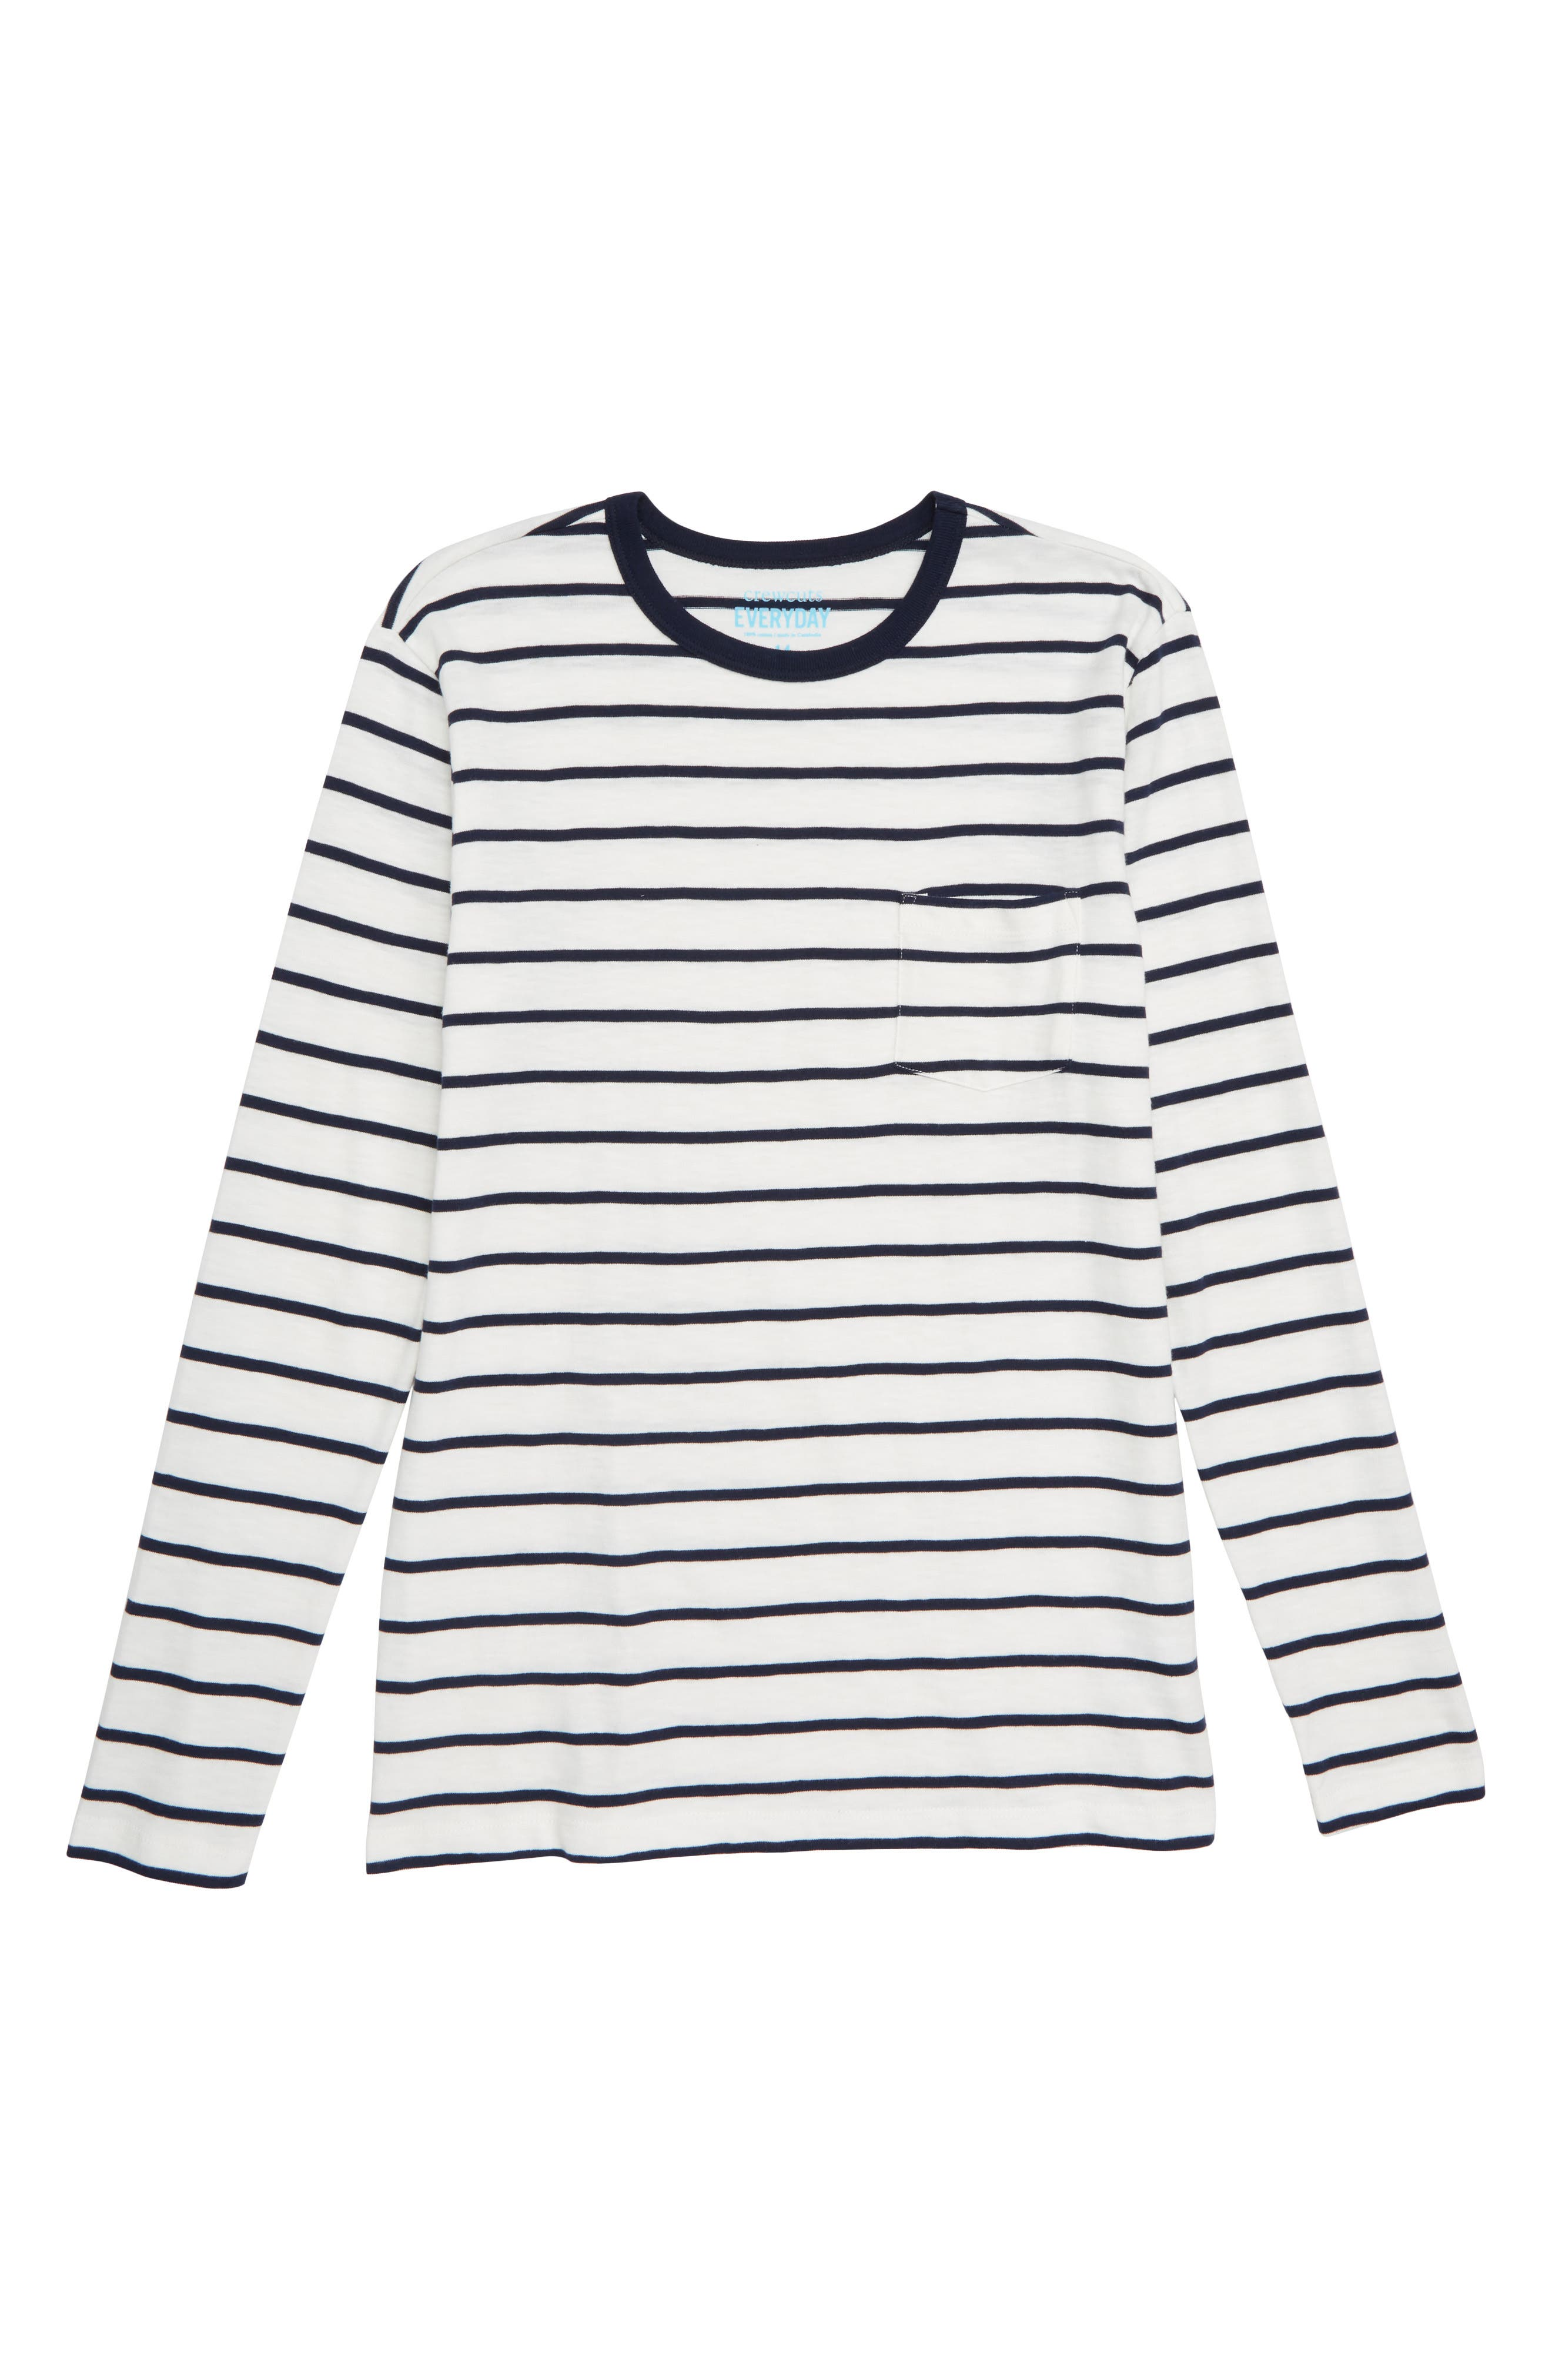 CREWCUTS BY J.CREW Stripe Slub Cotton T-Shirt, Main, color, 900